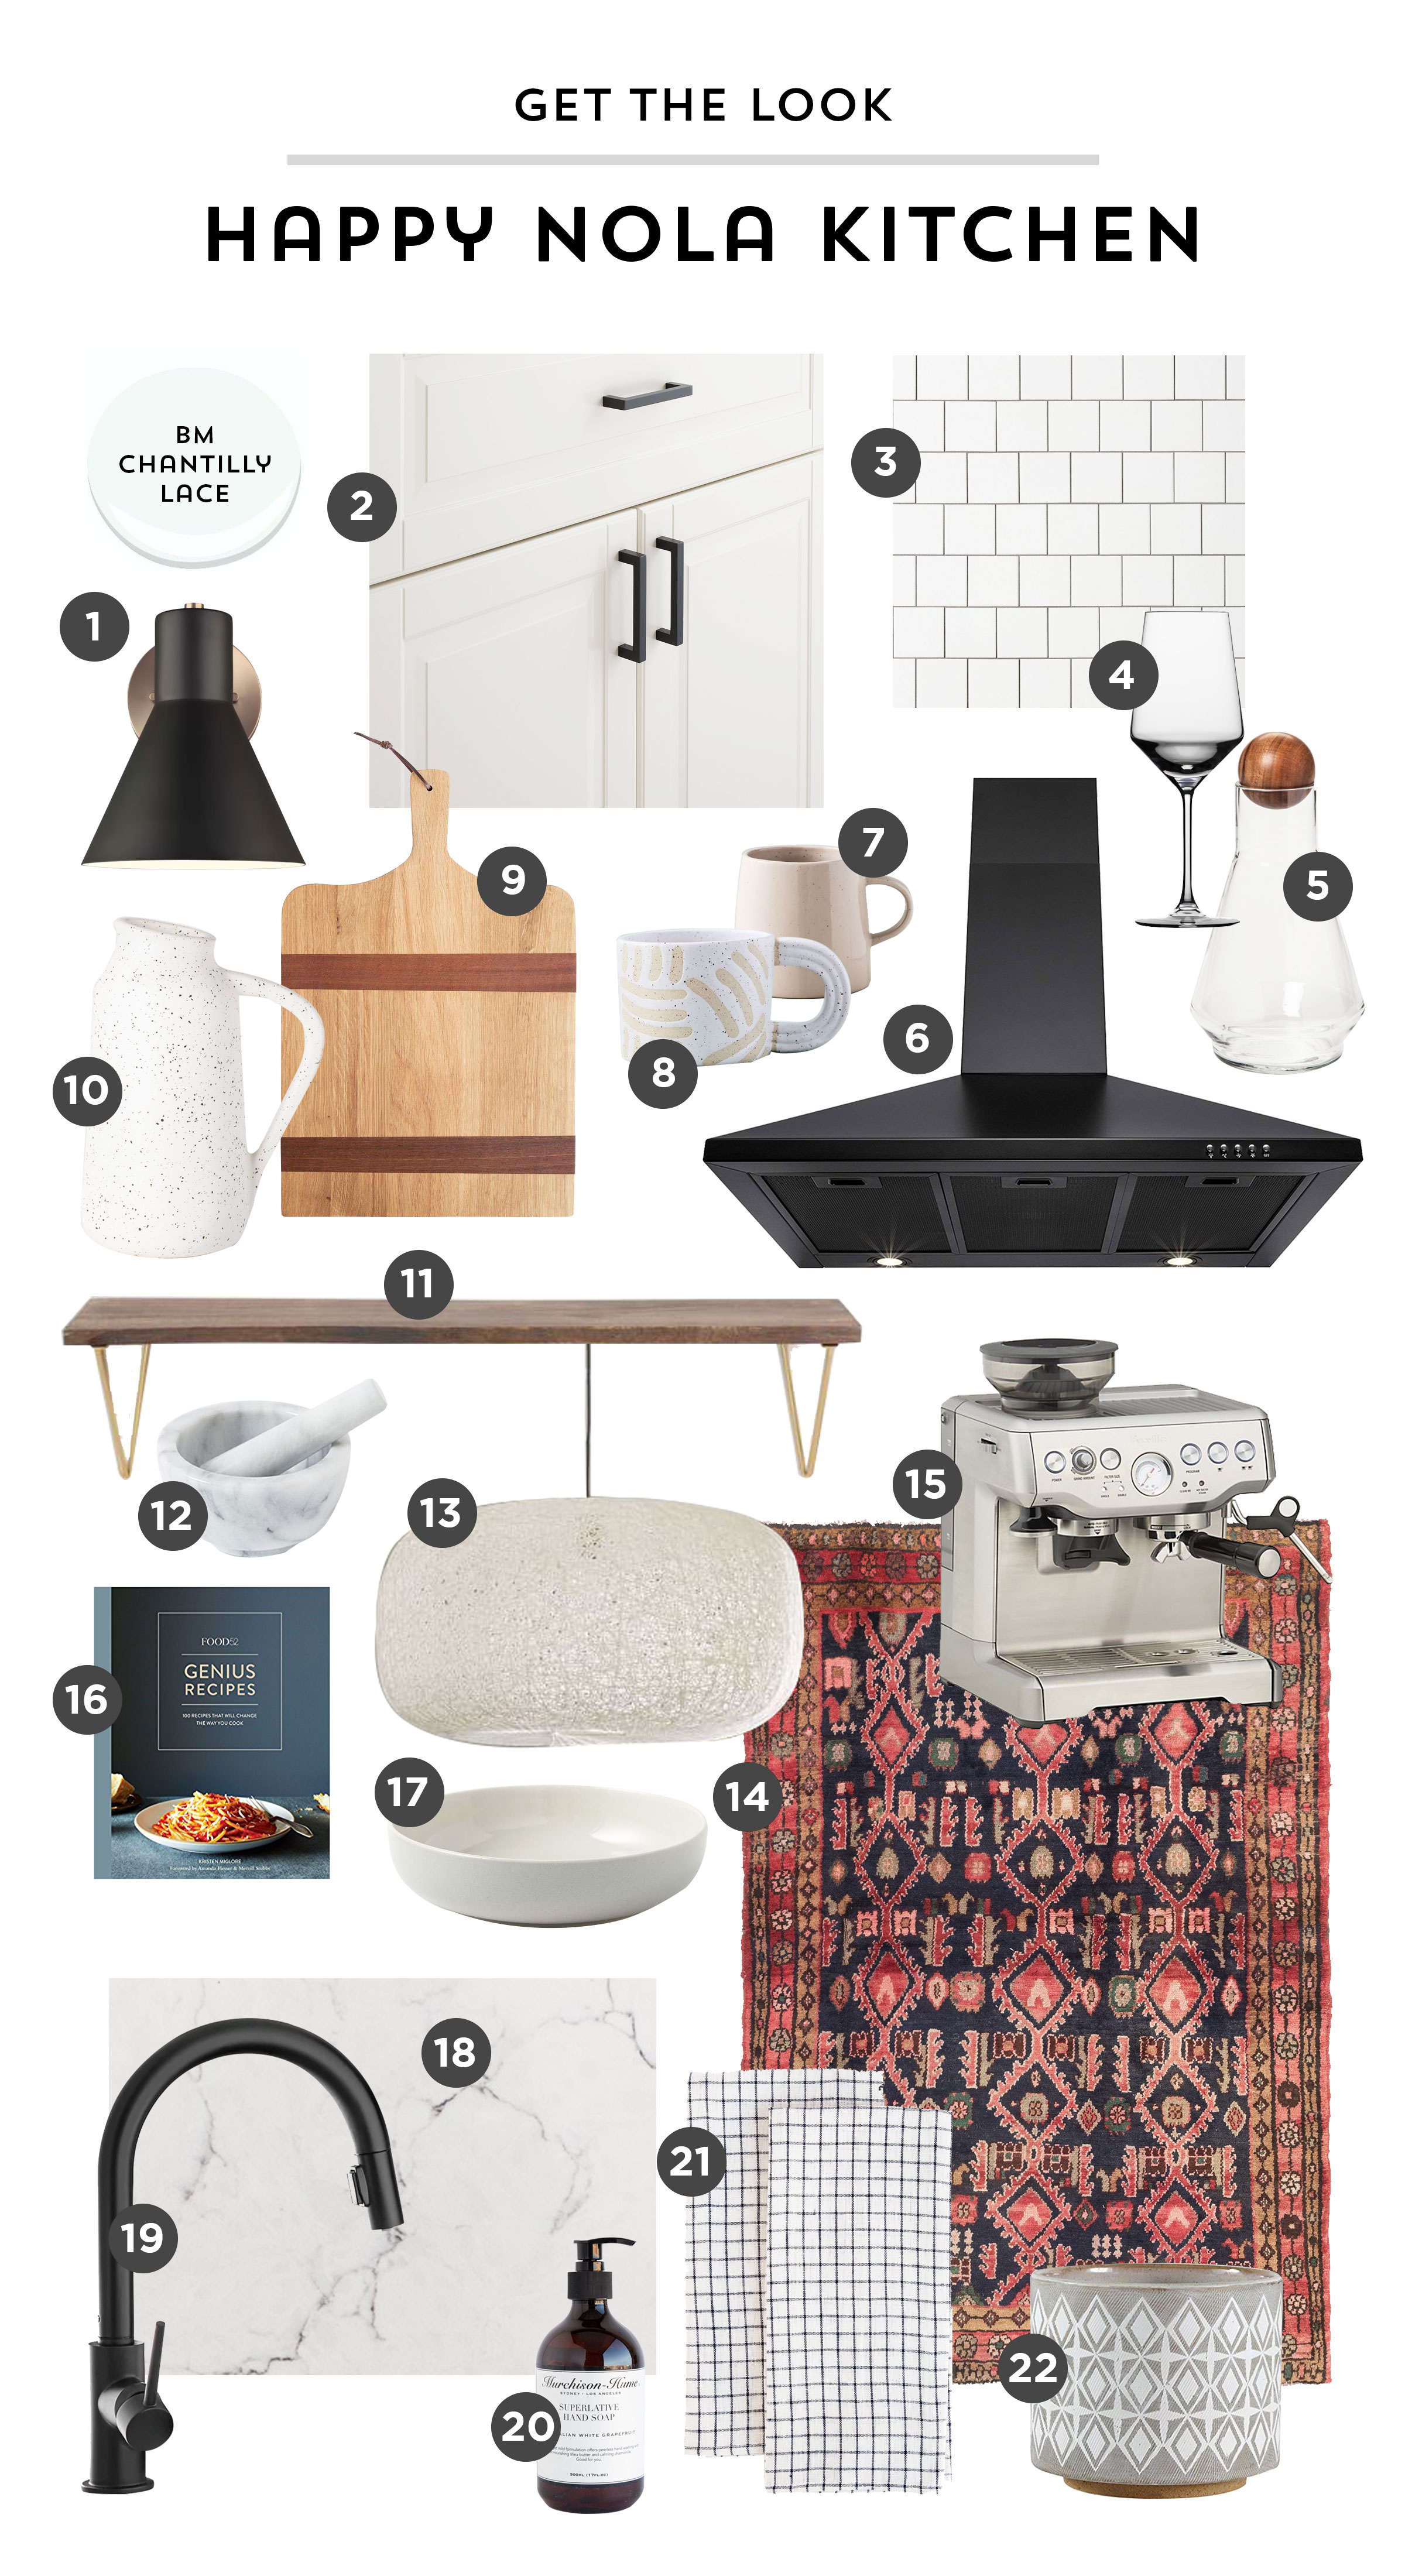 nola-kitchen-get-the-look.jpg